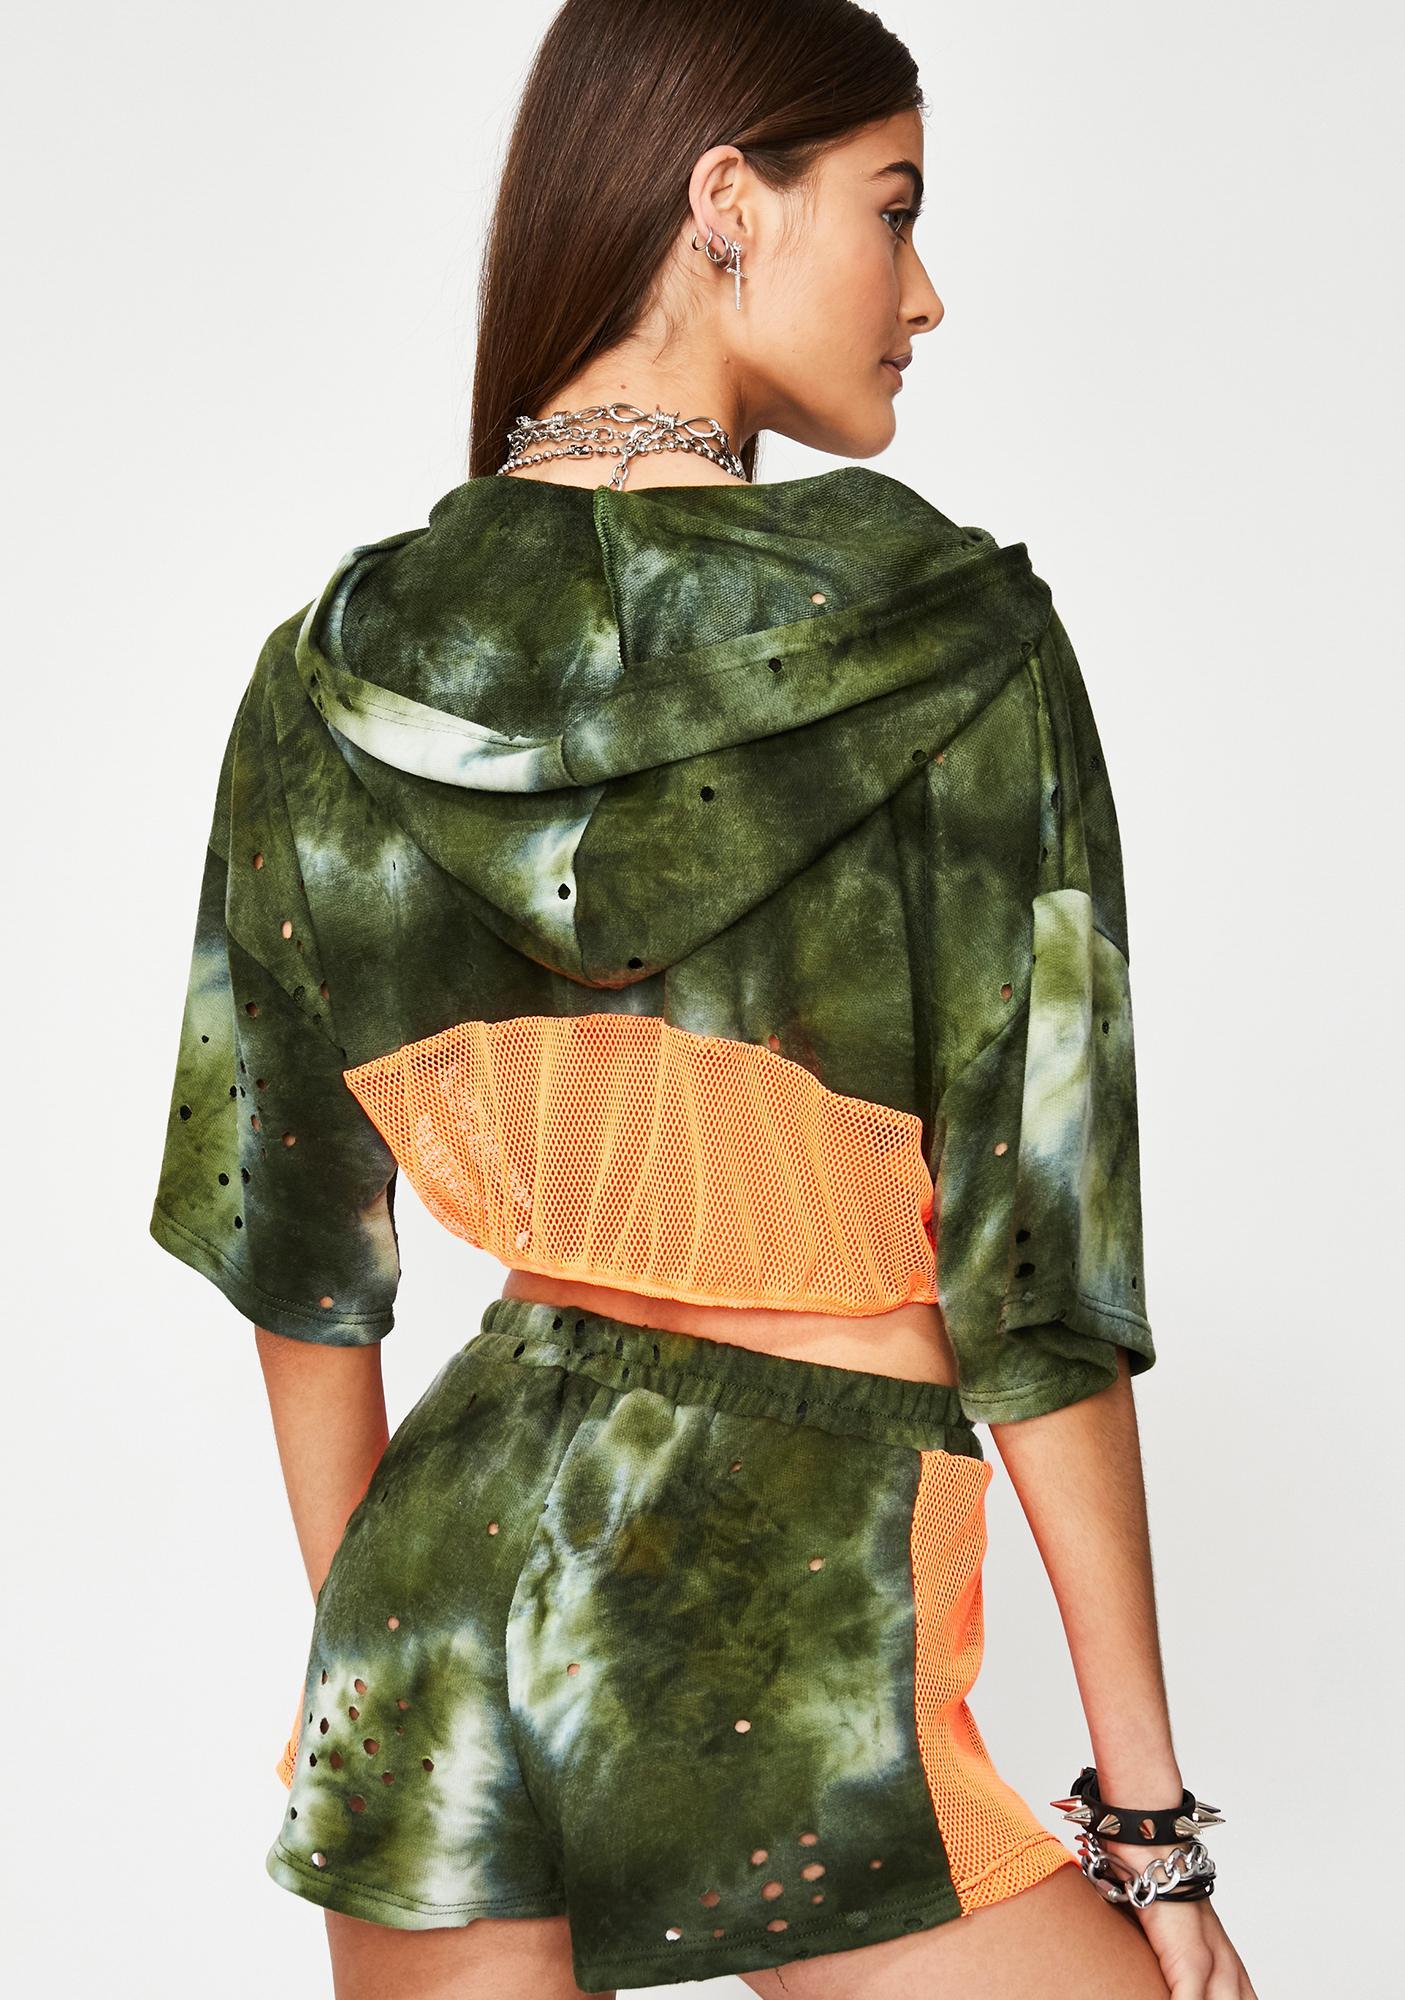 Emerald City Tie Dye Set